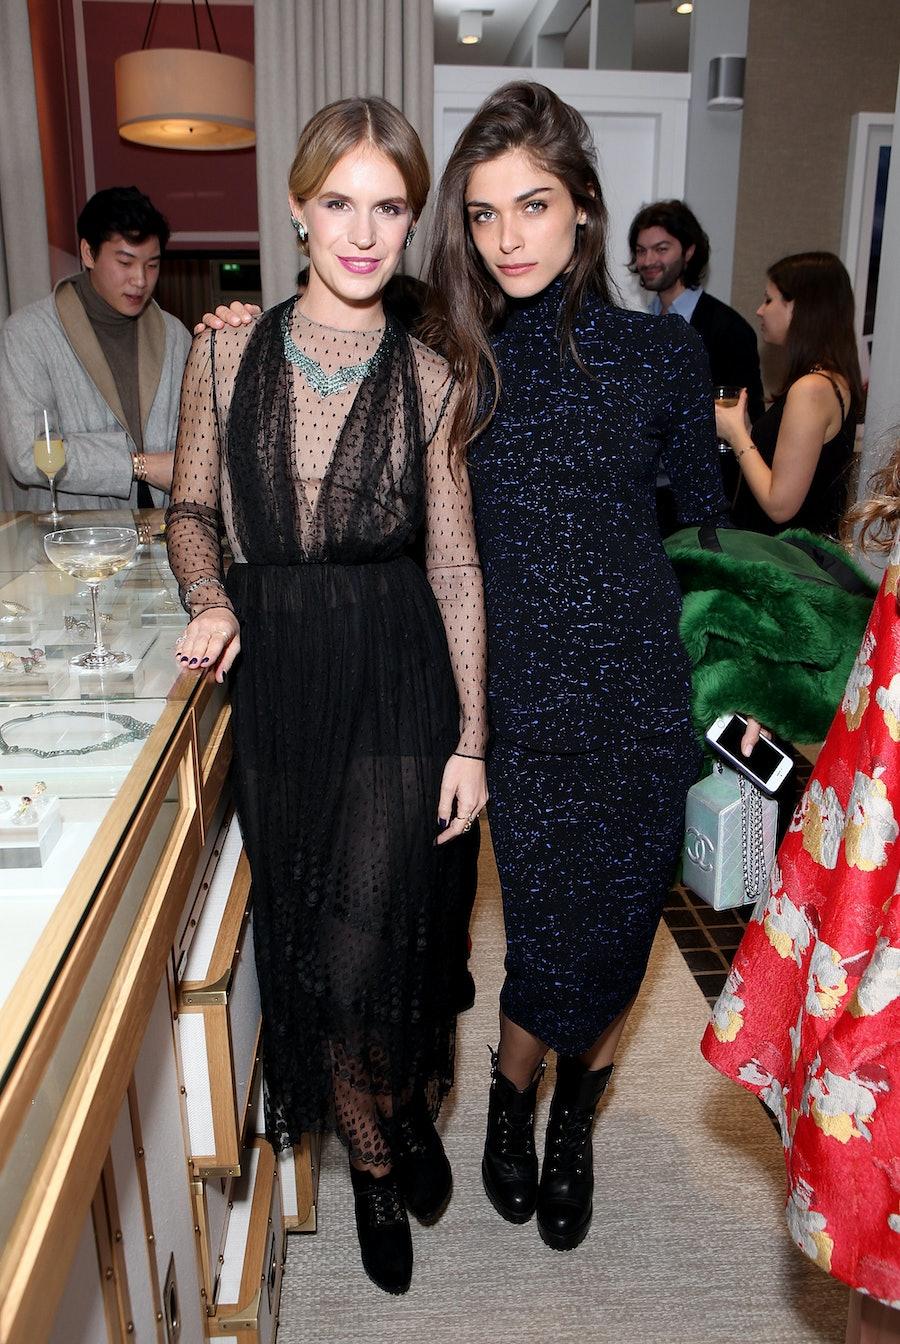 Eugenie Niarchos and Elisa Sednaoui